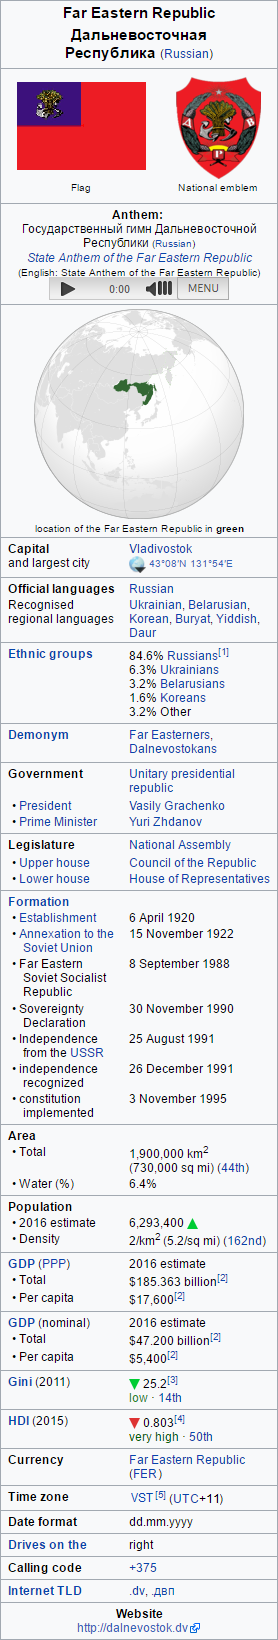 Far Eastern Republic Infobox by kyuzoaoi